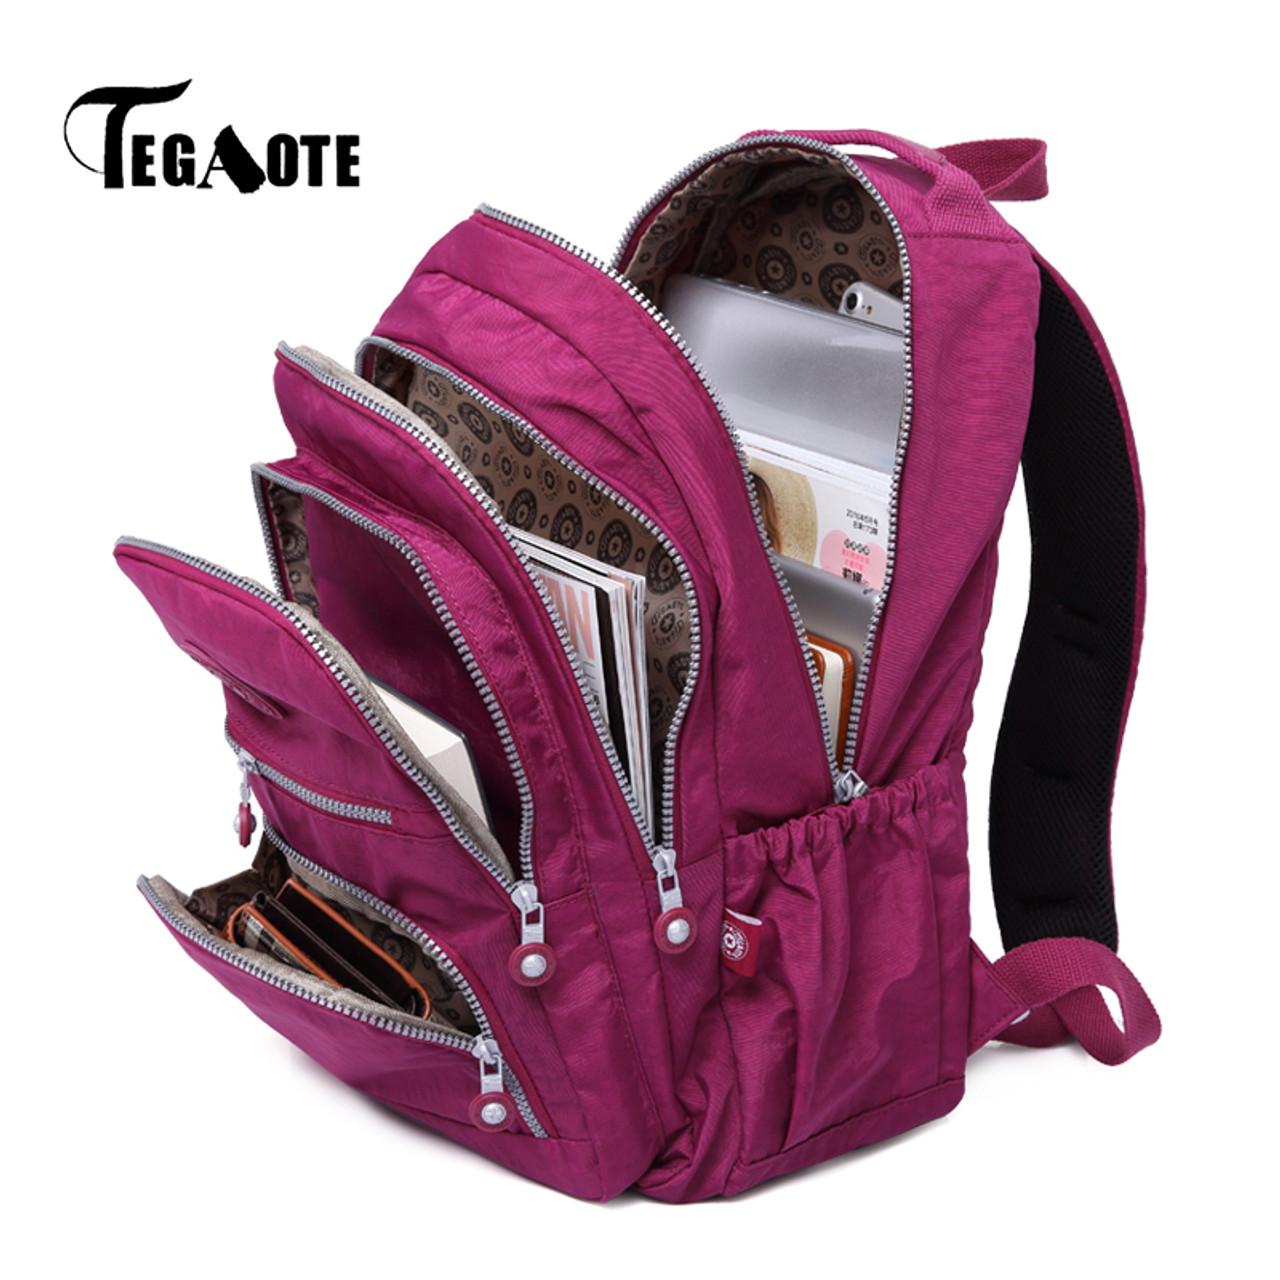 TEGAOTE School Backpack for Teenage Girls Mochila Feminina Escolar Women  Backpacks Nylon Casual Laptop Bagpack Female Sac A Dos - OnshopDeals.Com 5ac51ea576